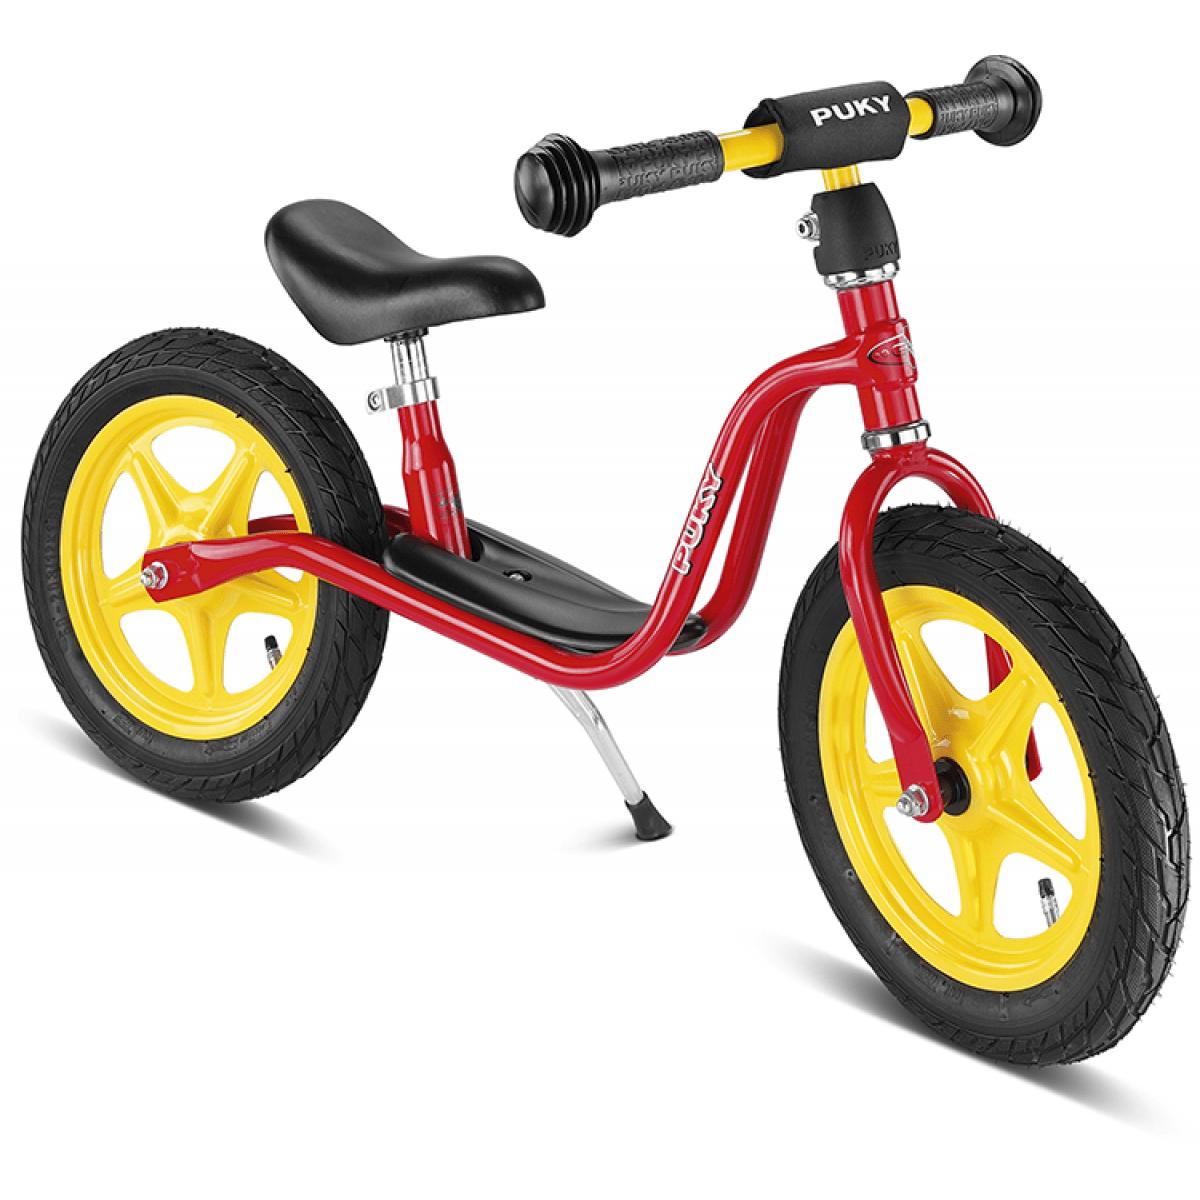 Puky LR1 løbecykel | Løbecykel